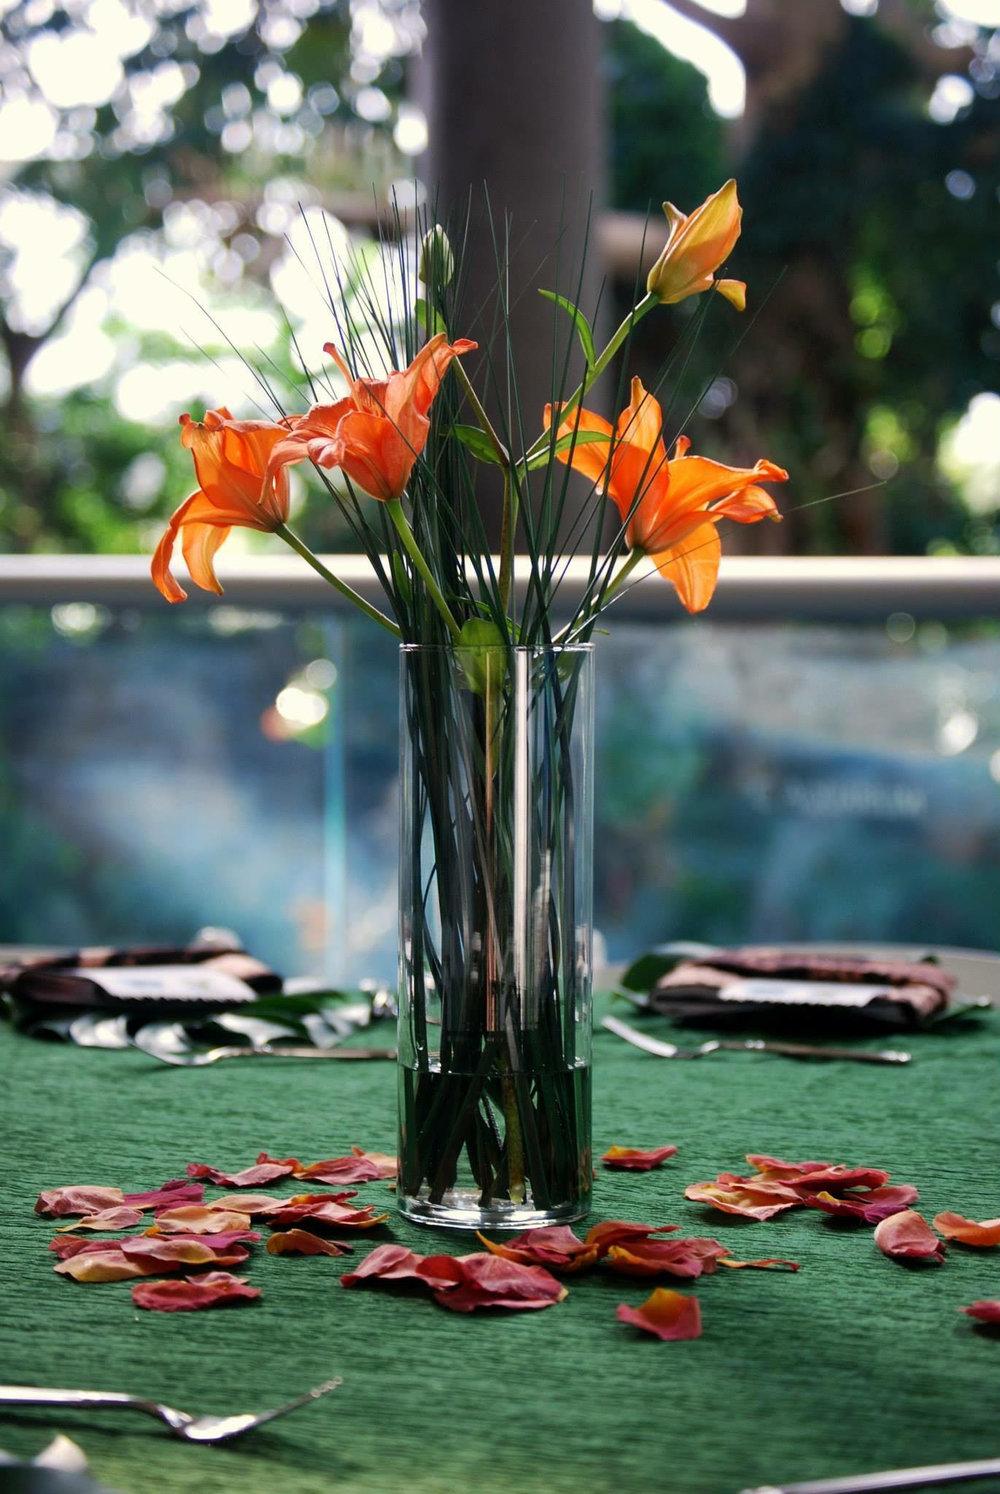 pa-pittsburgh-wedding-flowers-10.jpg